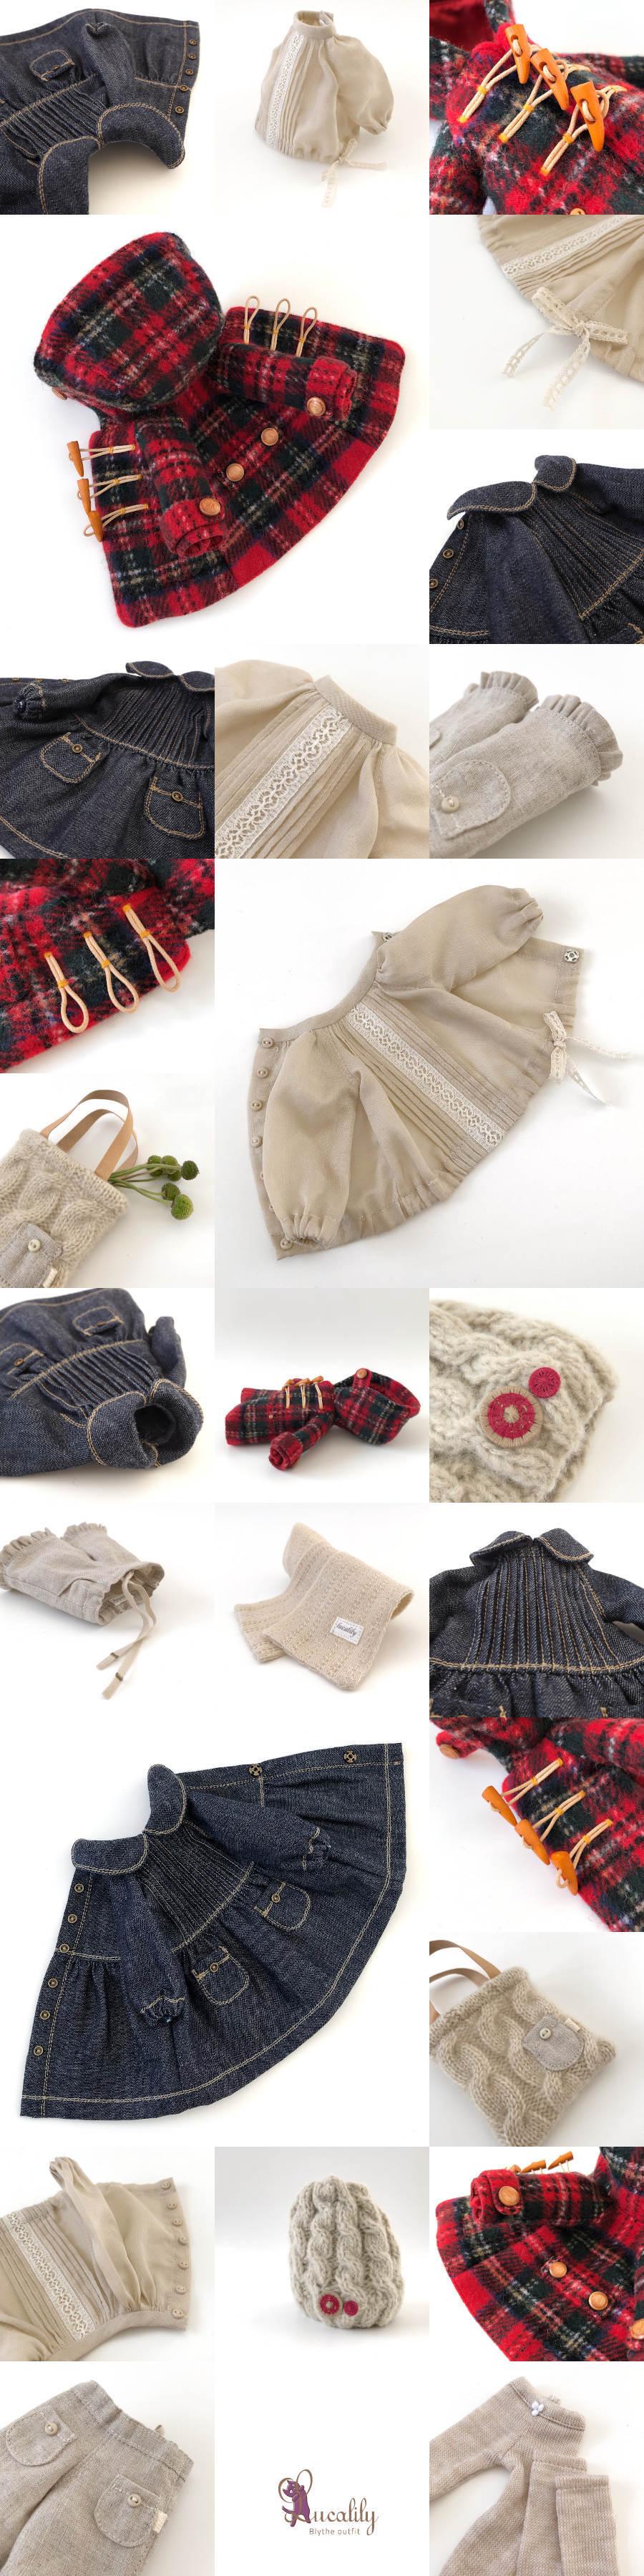 *lucalily * dolls clothes* Stewart Royal Duffle Coat Set *_d0217189_22590060.jpg